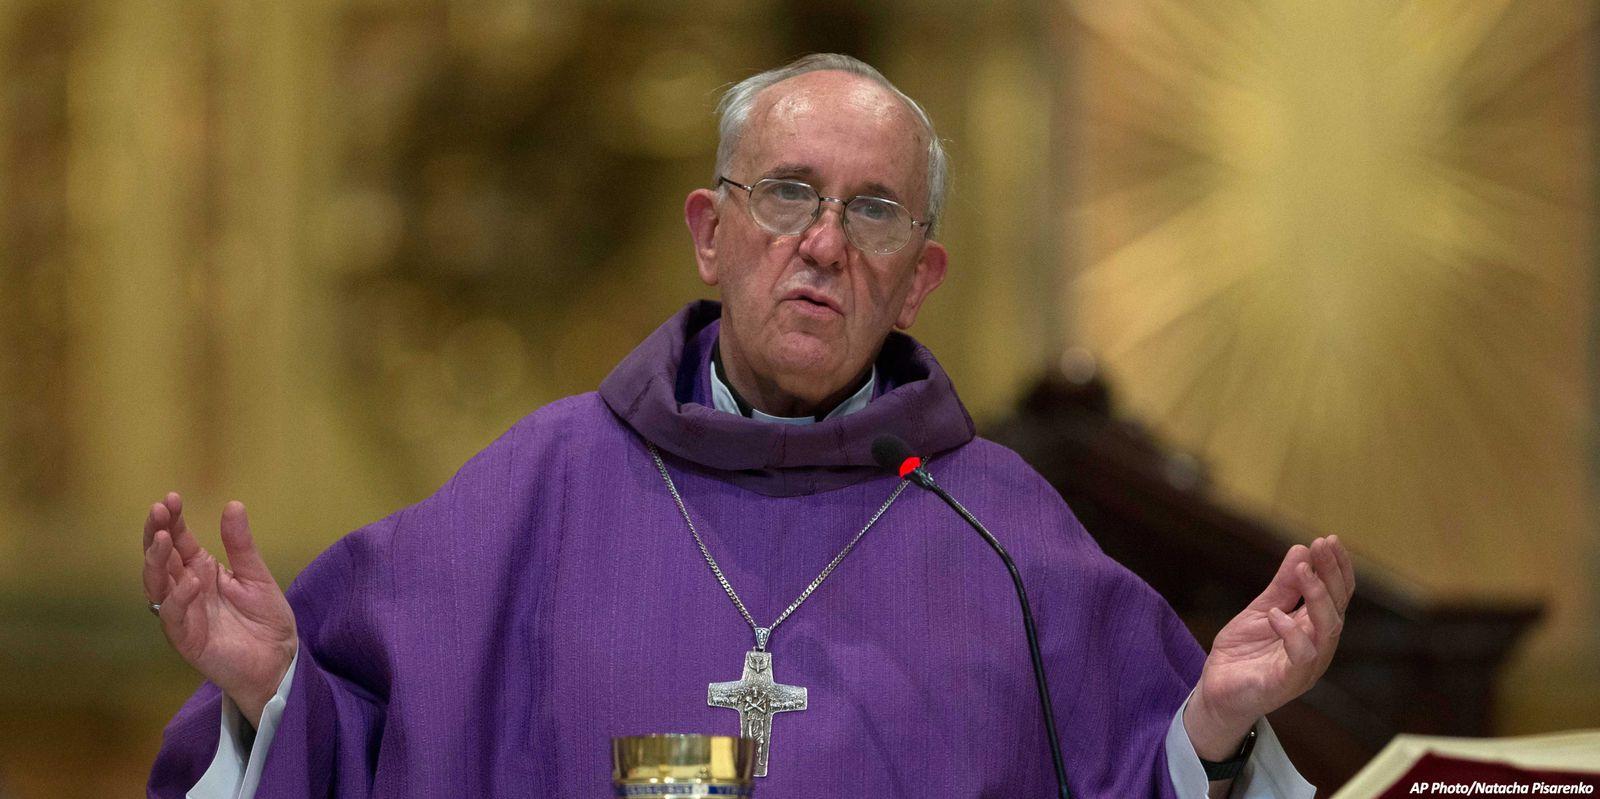 Jorge Mario Bergoglio est élu pape